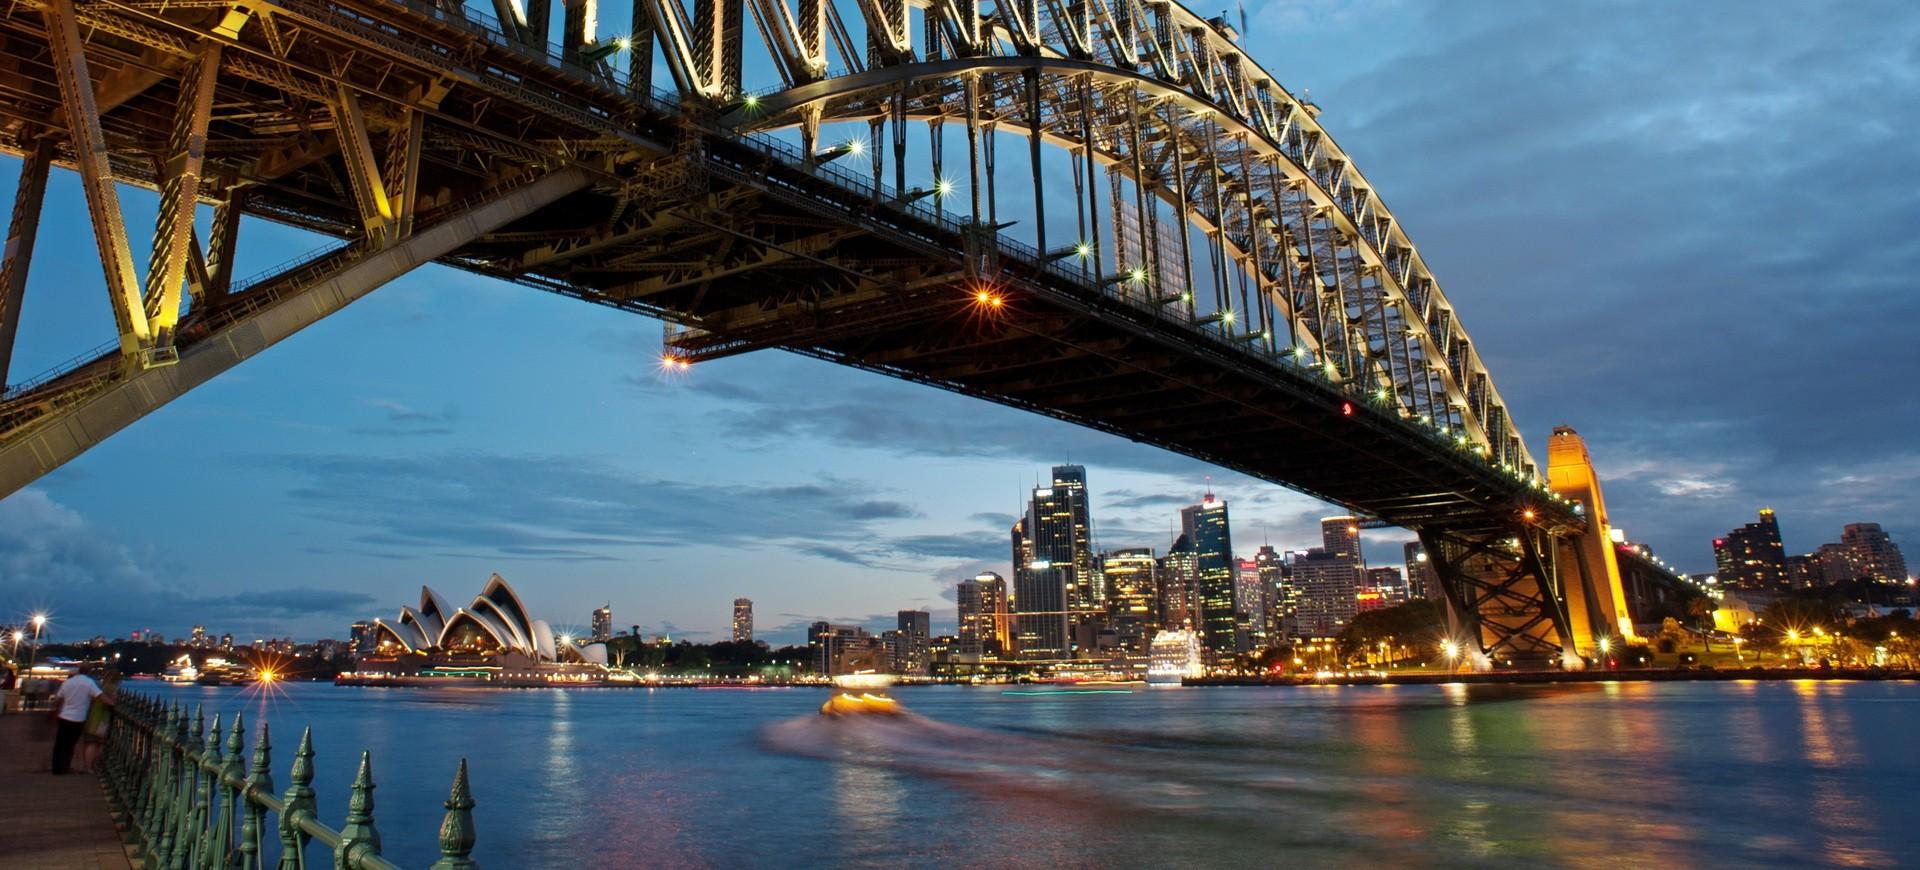 Sydney Harbour Bridge by night en Australie